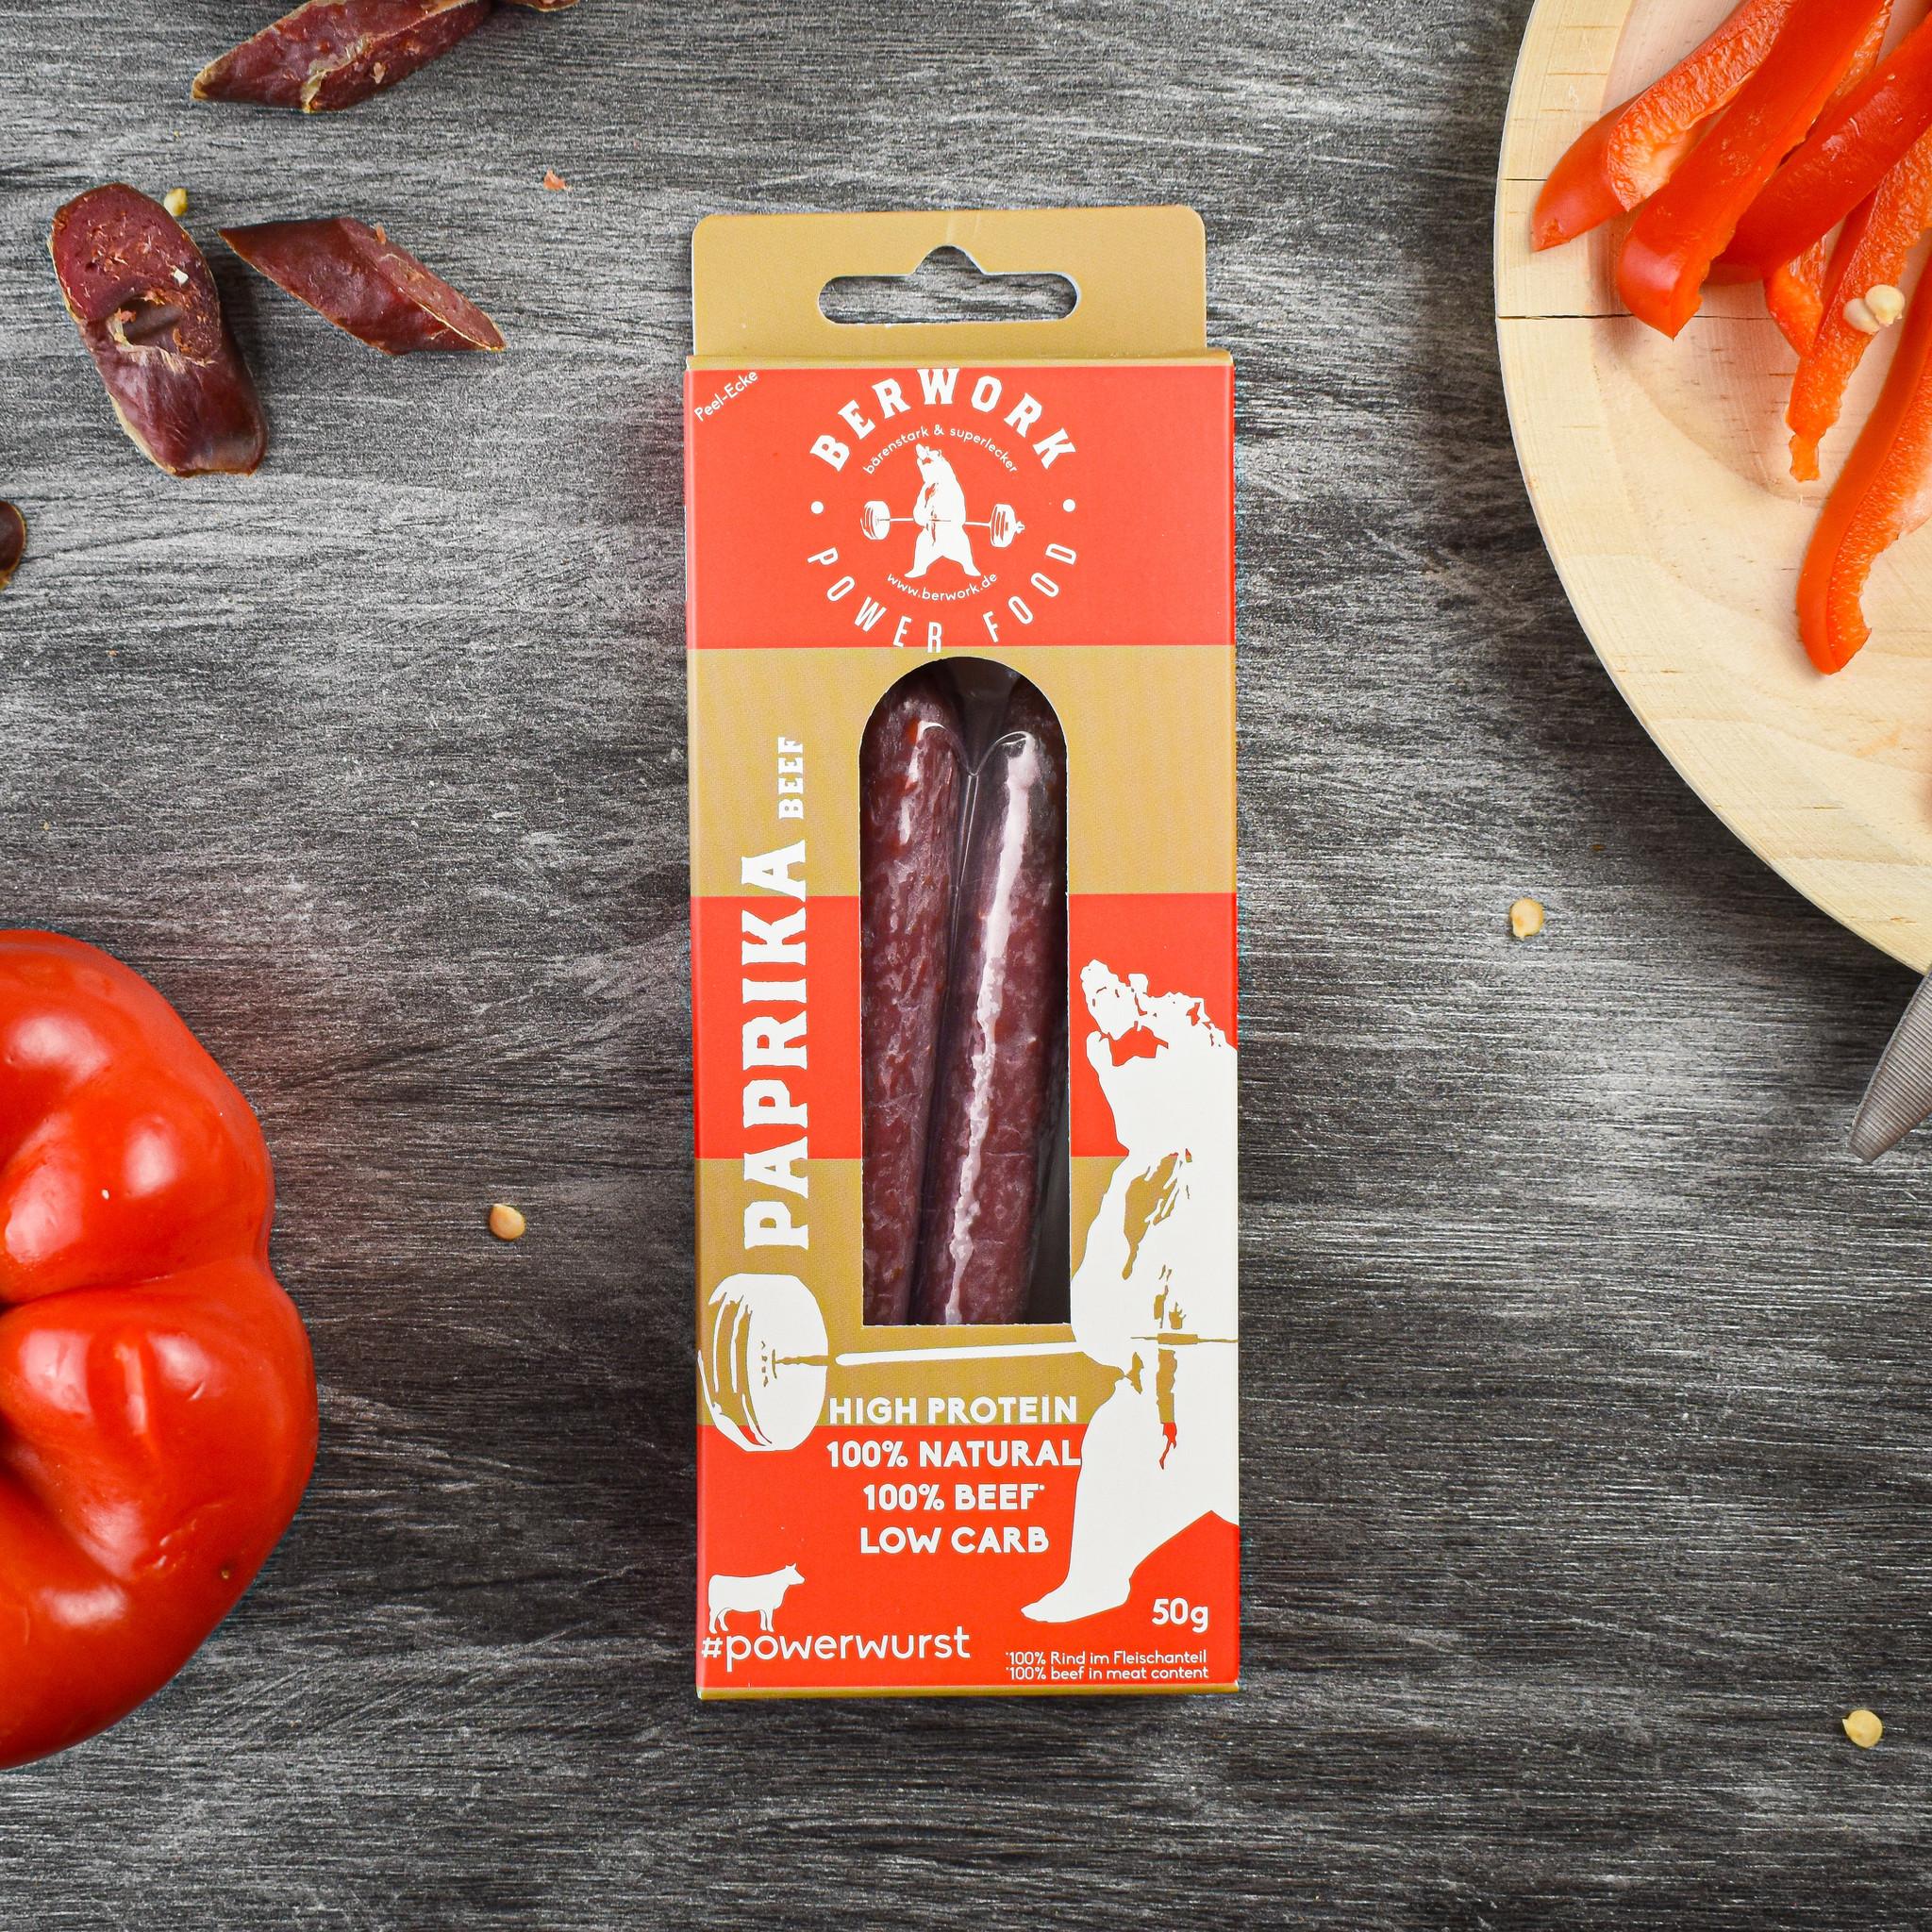 berwork Power sausage Paprika Beef (50g)